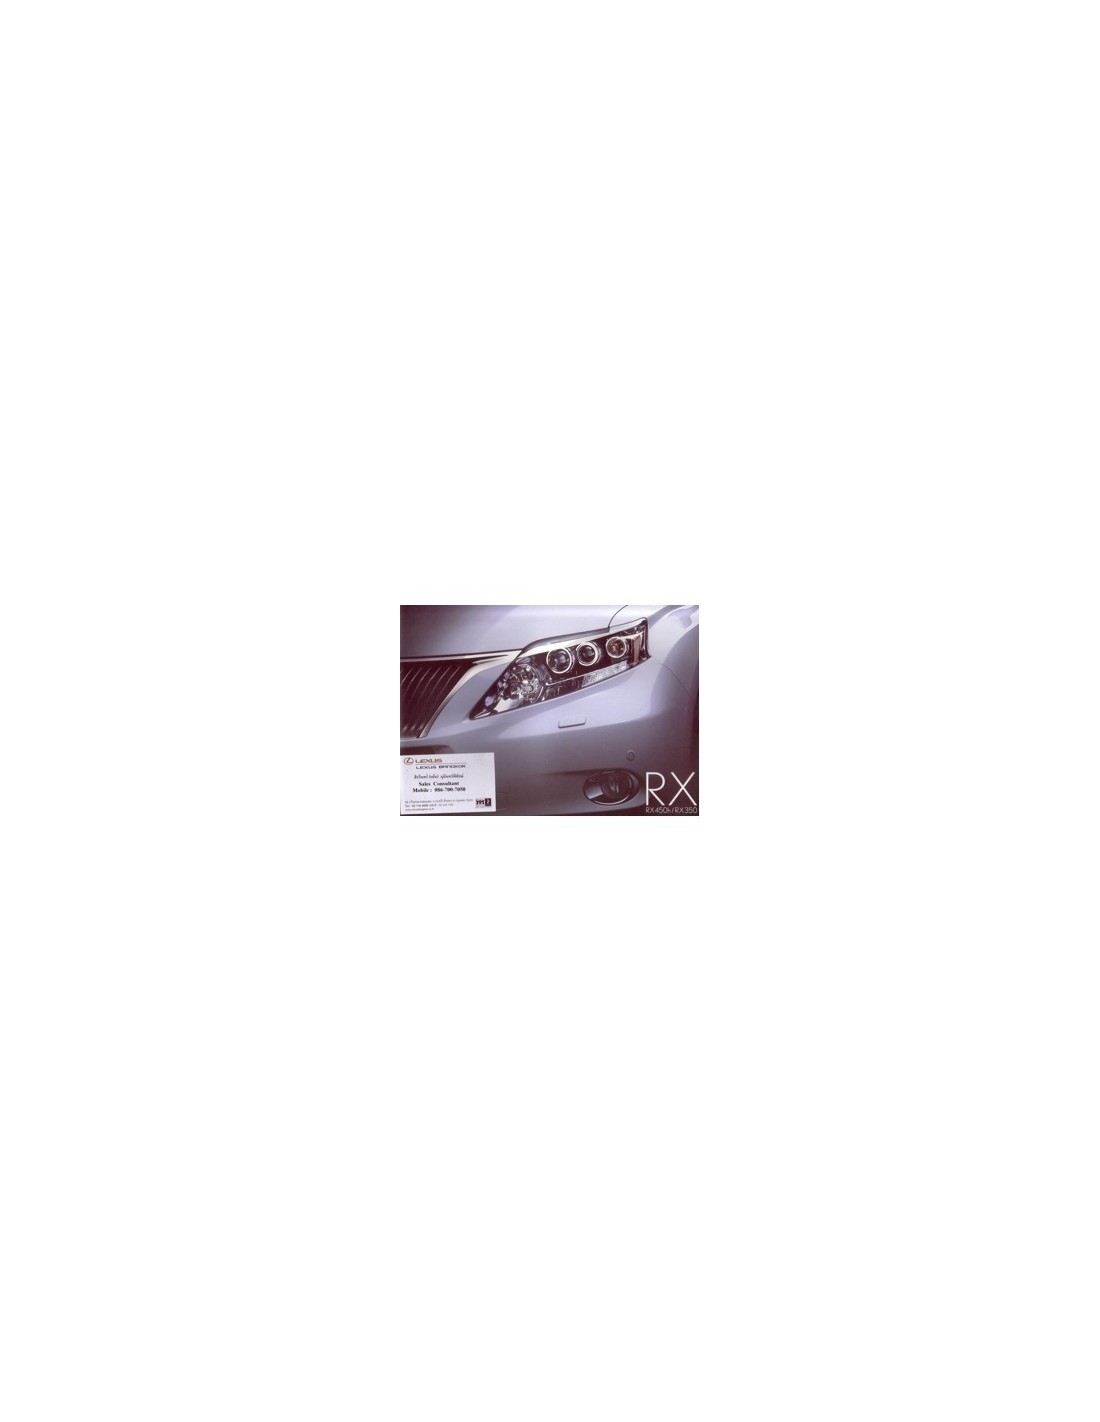 2010 LEXUS RX 450 350 BROCHURE THAI - Automotive Literature